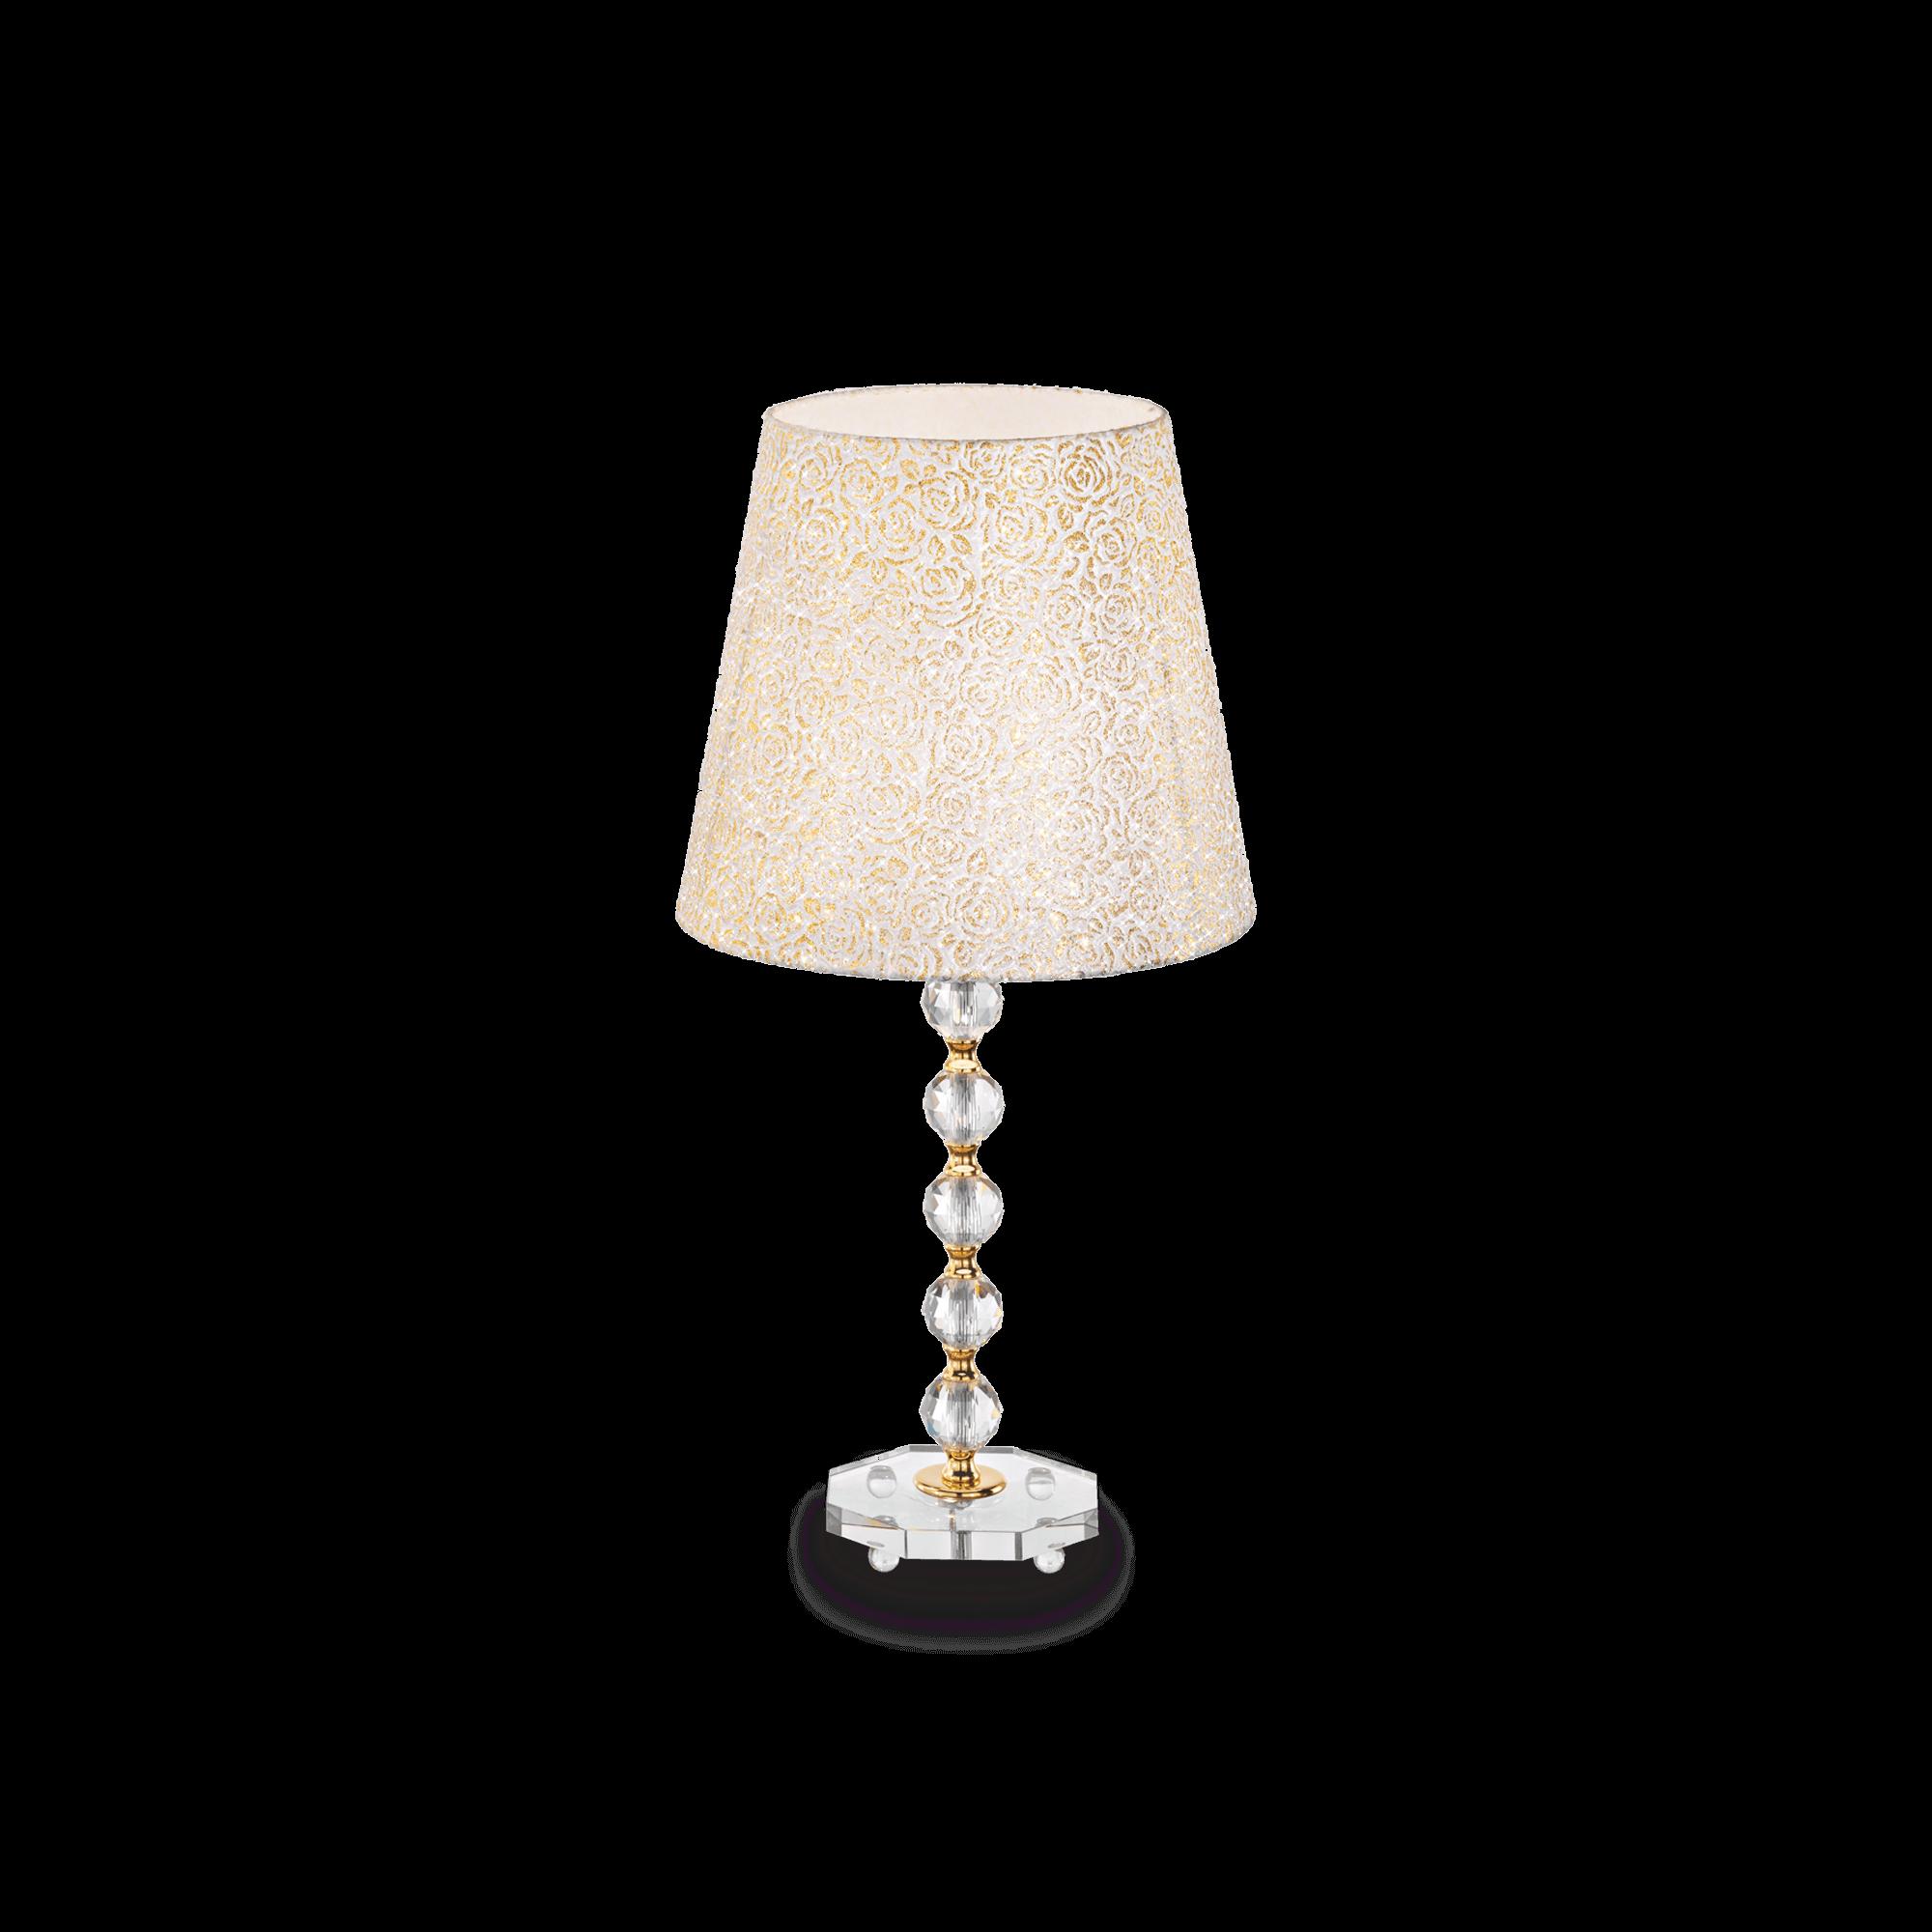 IDEAL LUX LAMPADA DA TAVOLO QUEEN TL1 BIG